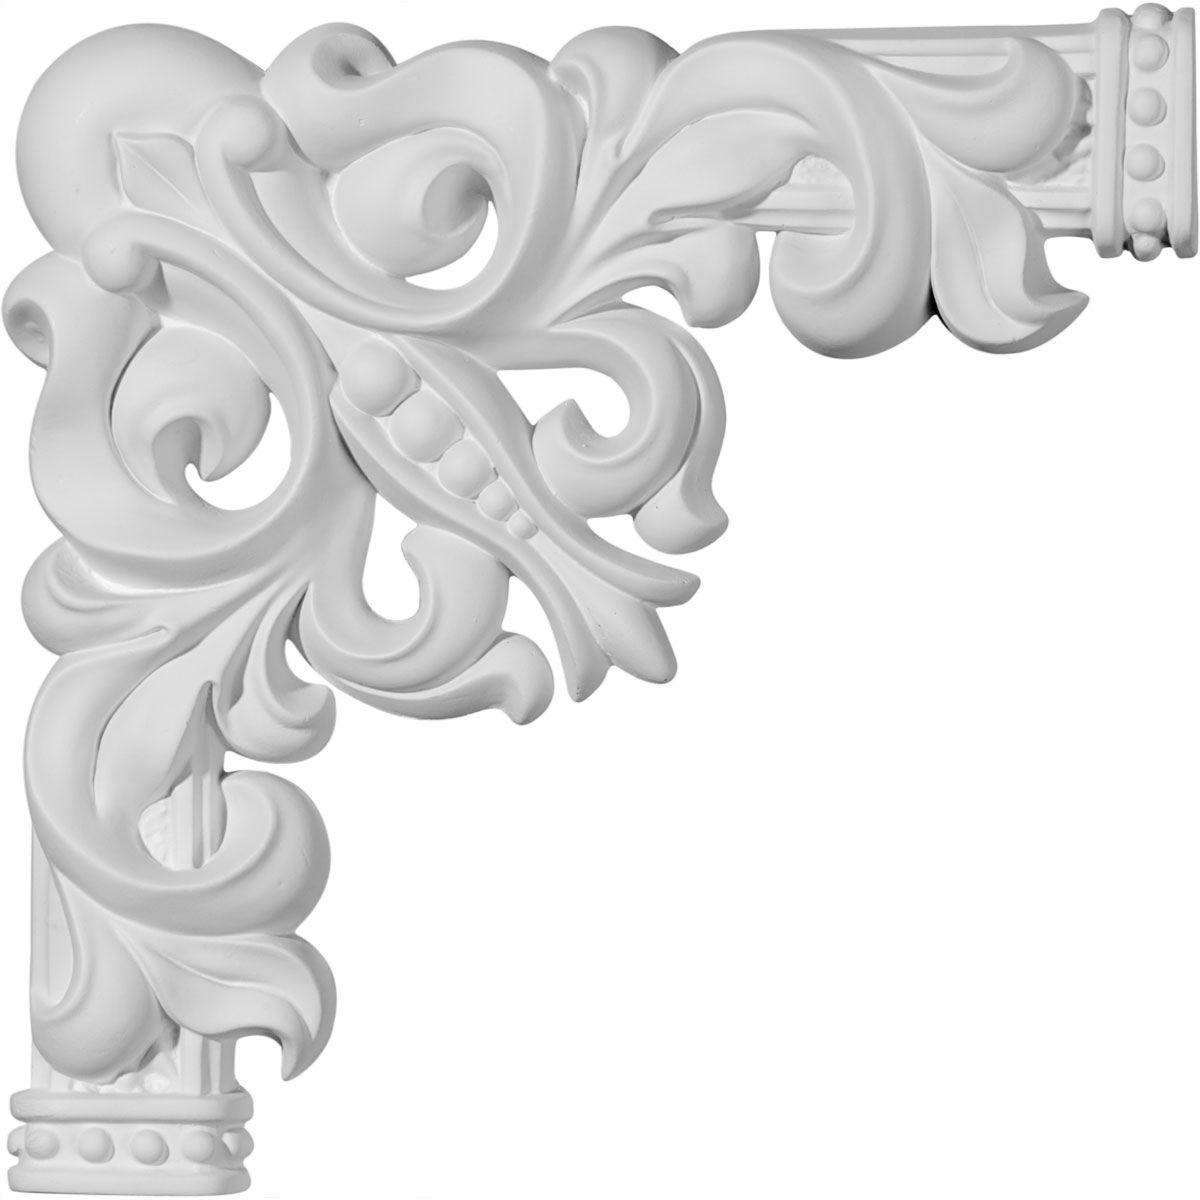 Ekena Millwork Polyurethane Panel Moulding Corner 11in 11 1 4in W X 11 1 4in H Aberdeen Panel Moulding Corner